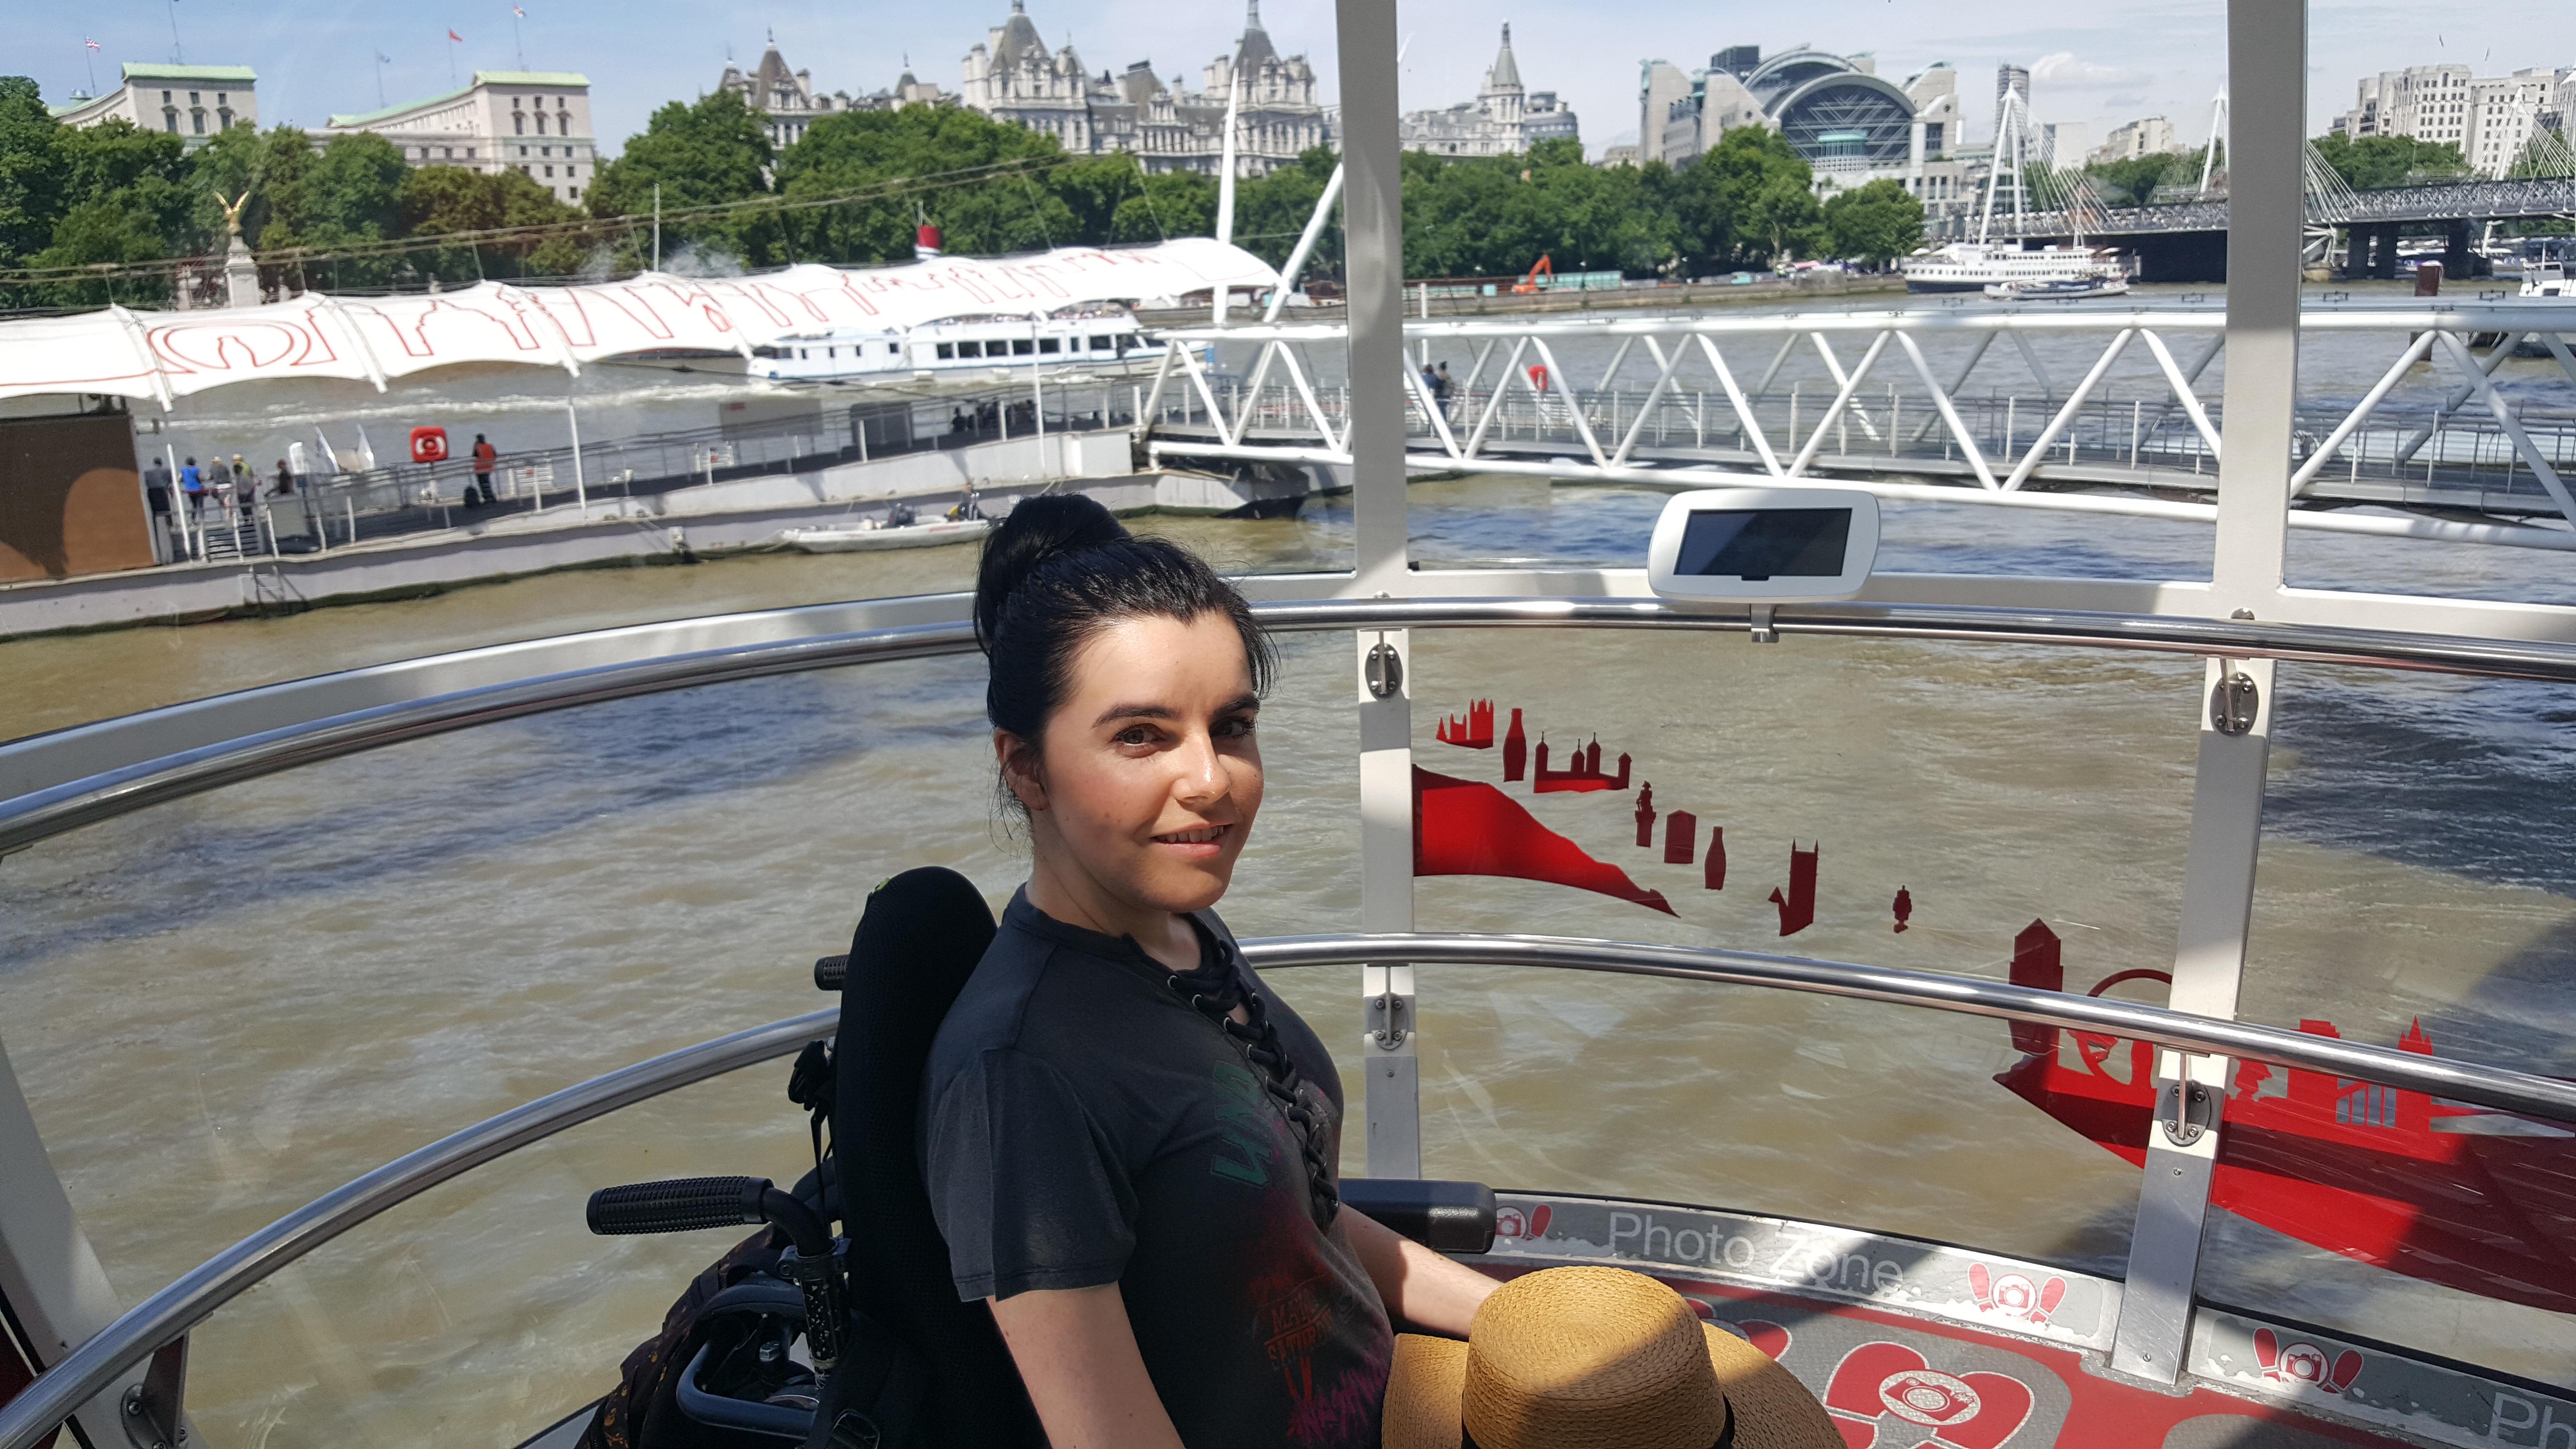 london-photo-diary-wheelchair-access-london-eye